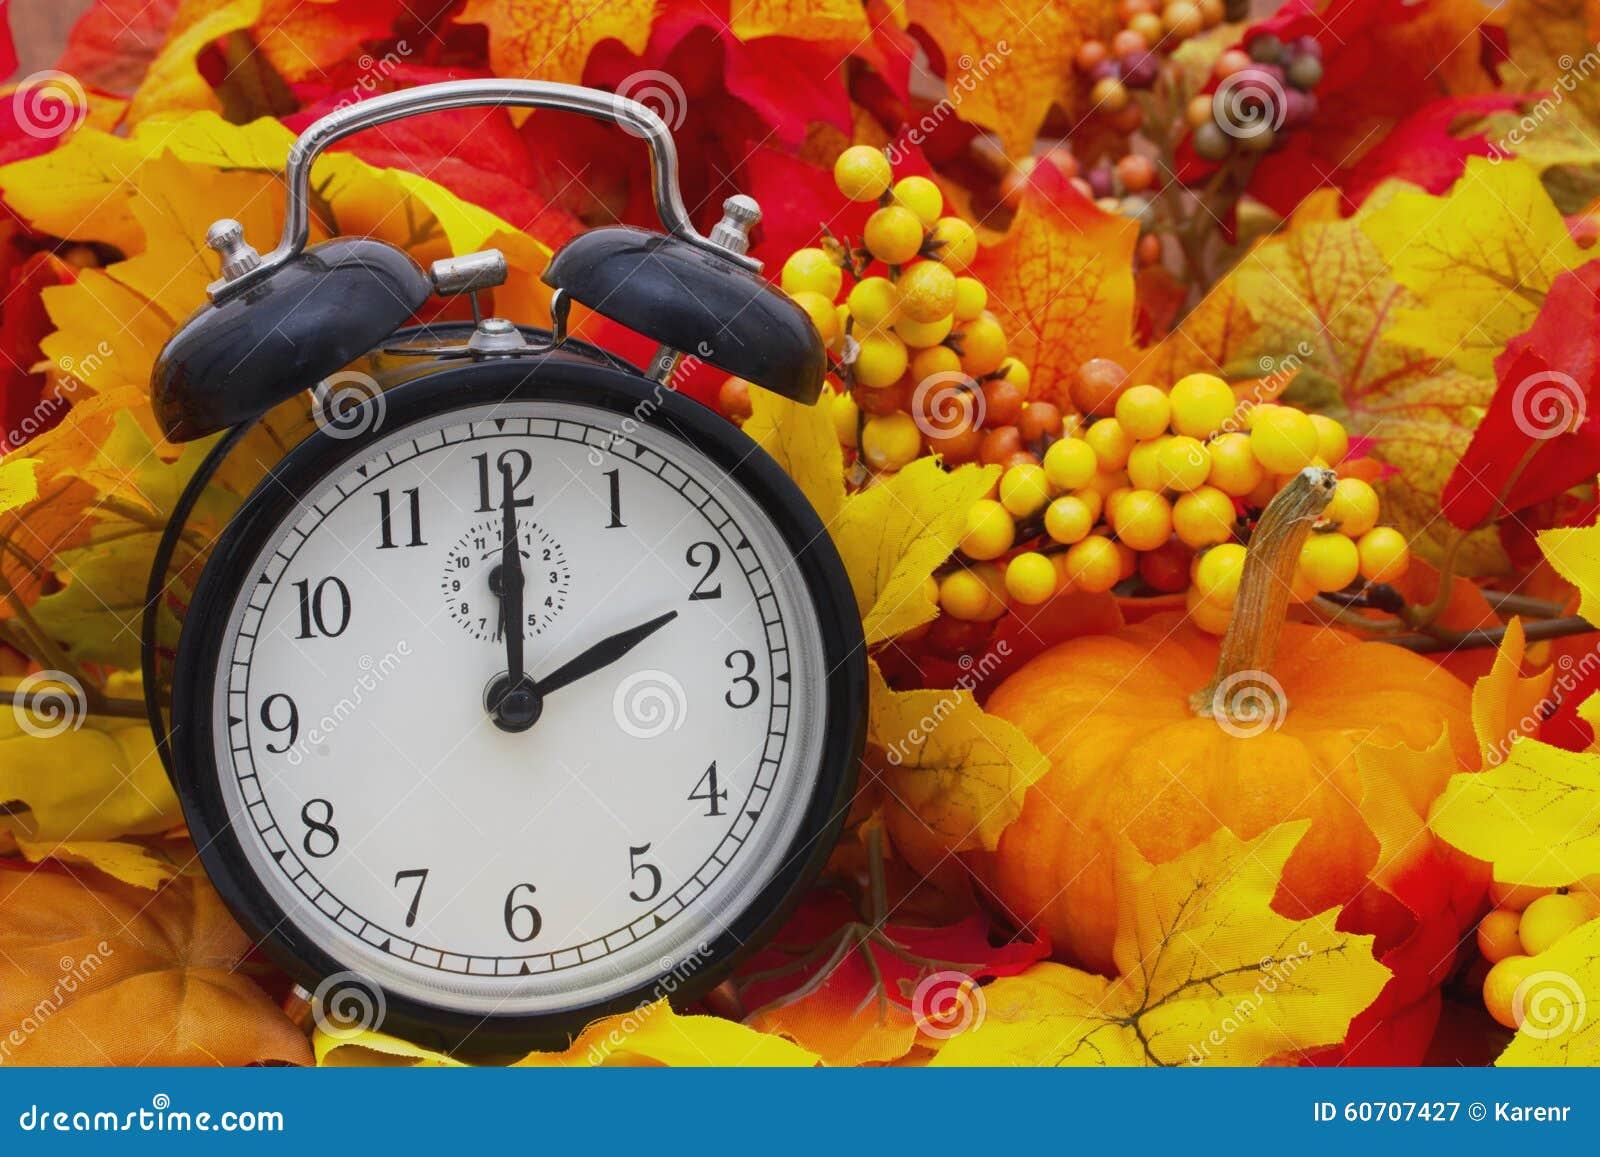 Time change date in Brisbane